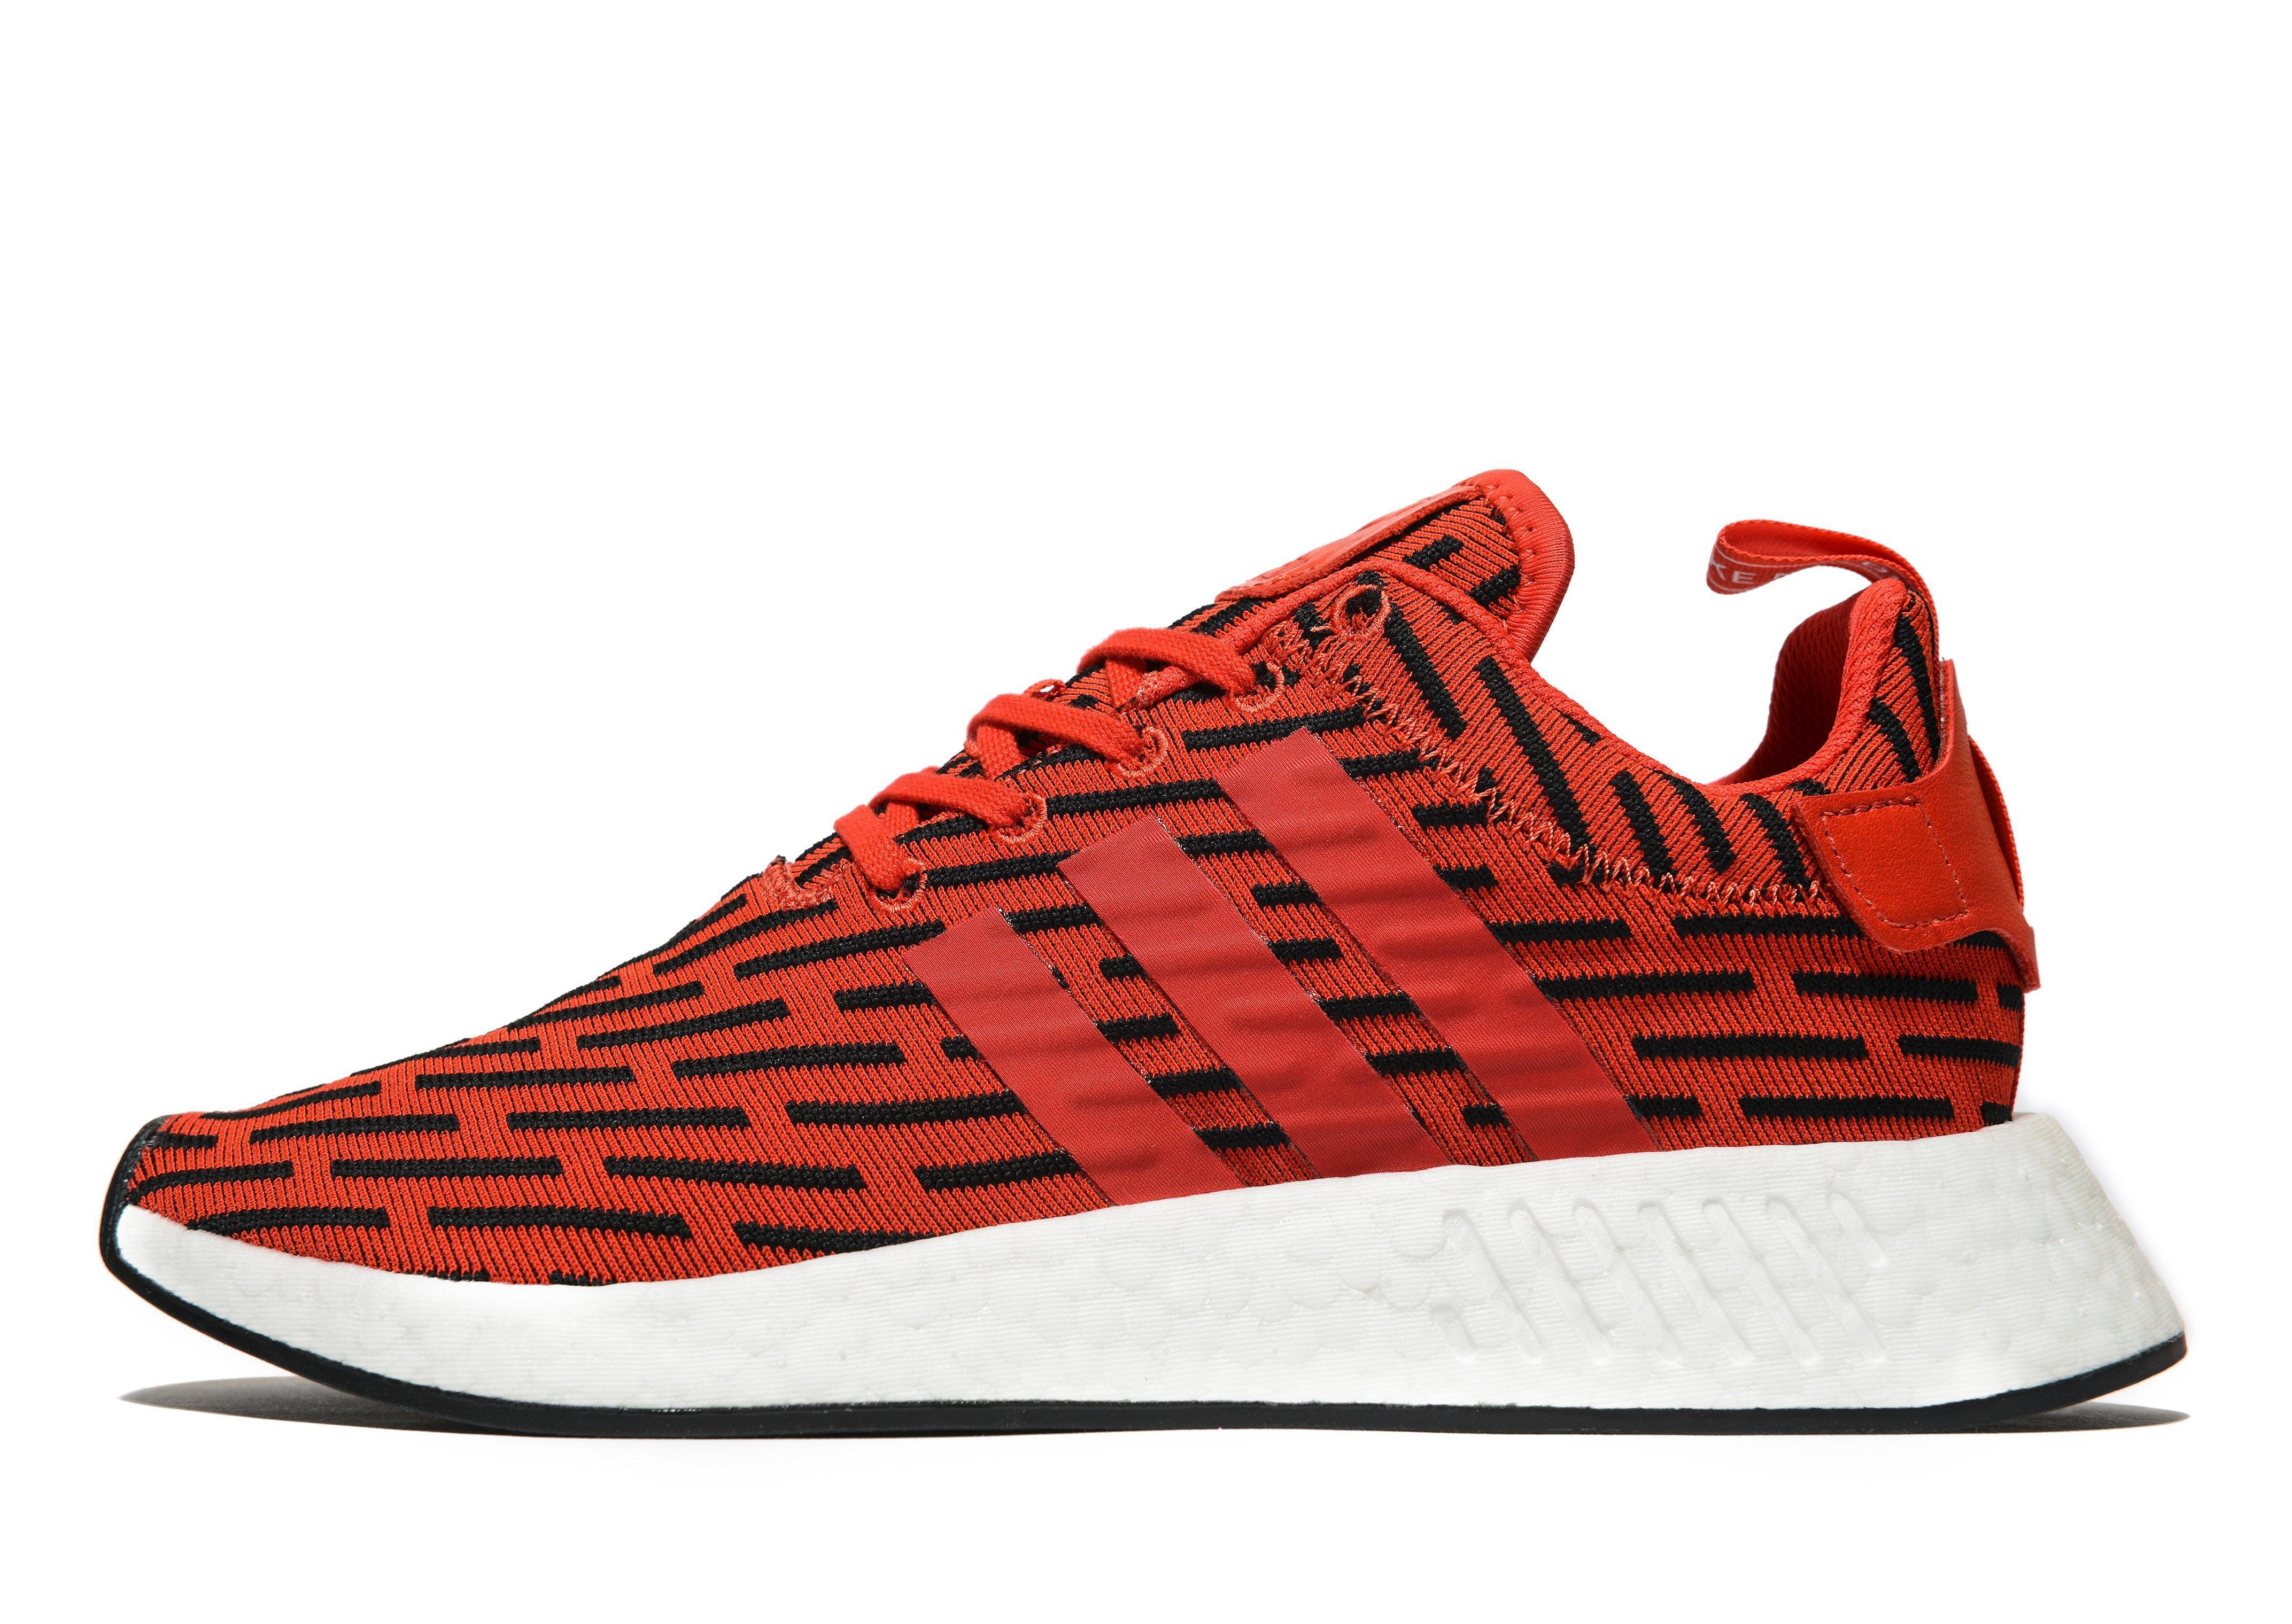 quality design c4d4d 10012 Lyst - Adidas Originals Nmd R2 in Red for Men